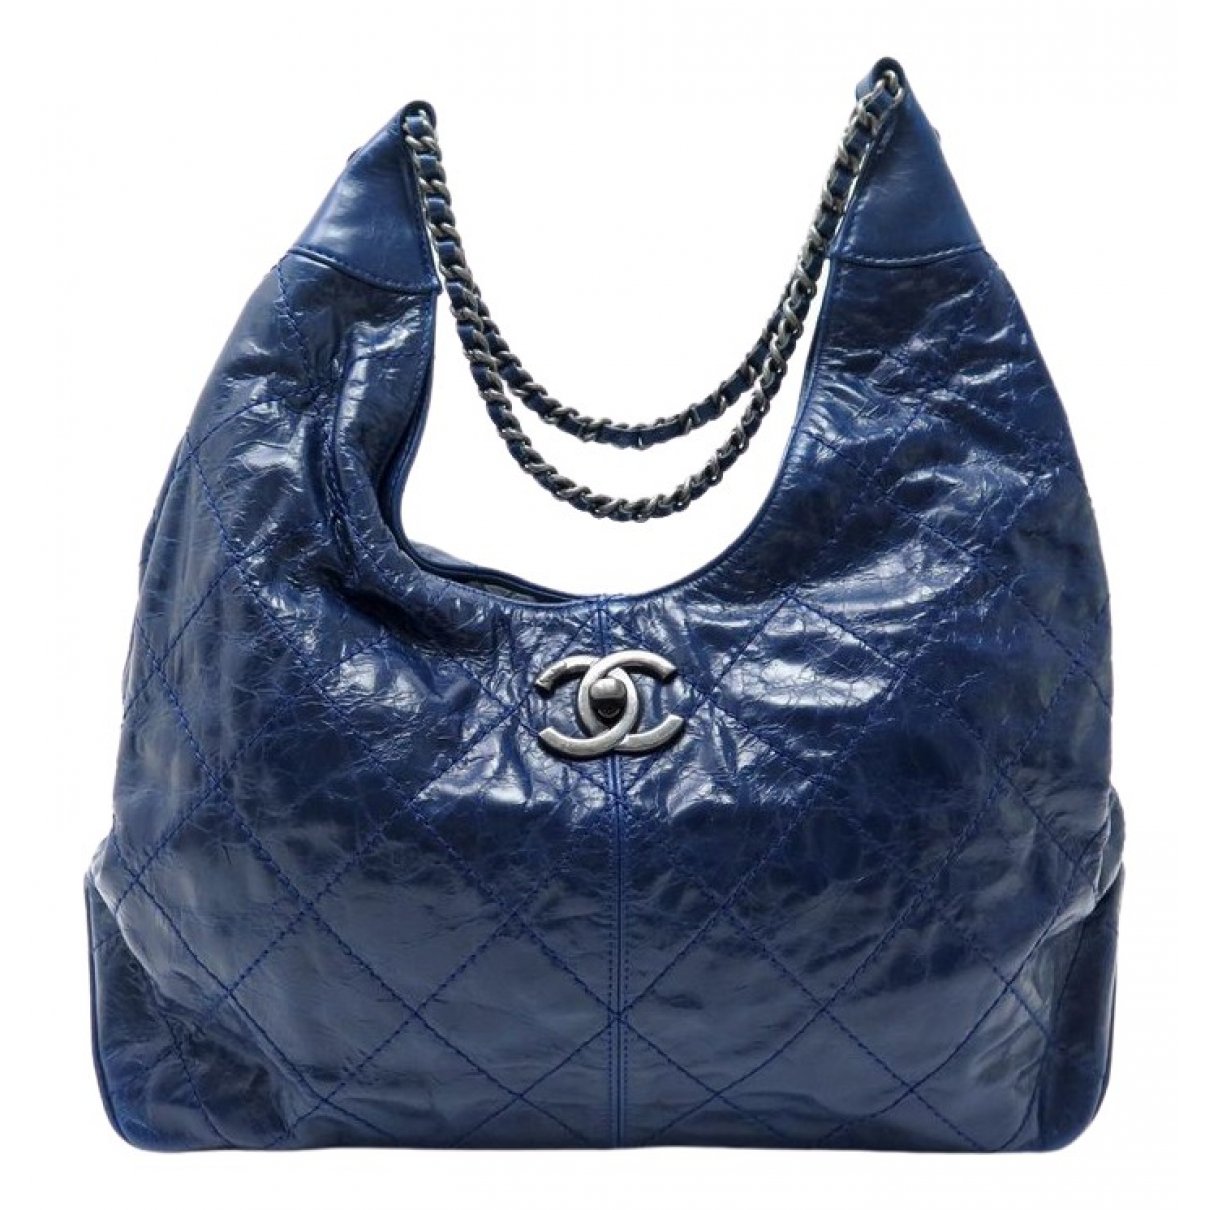 Chanel - Sac a main   pour femme en cuir verni - bleu